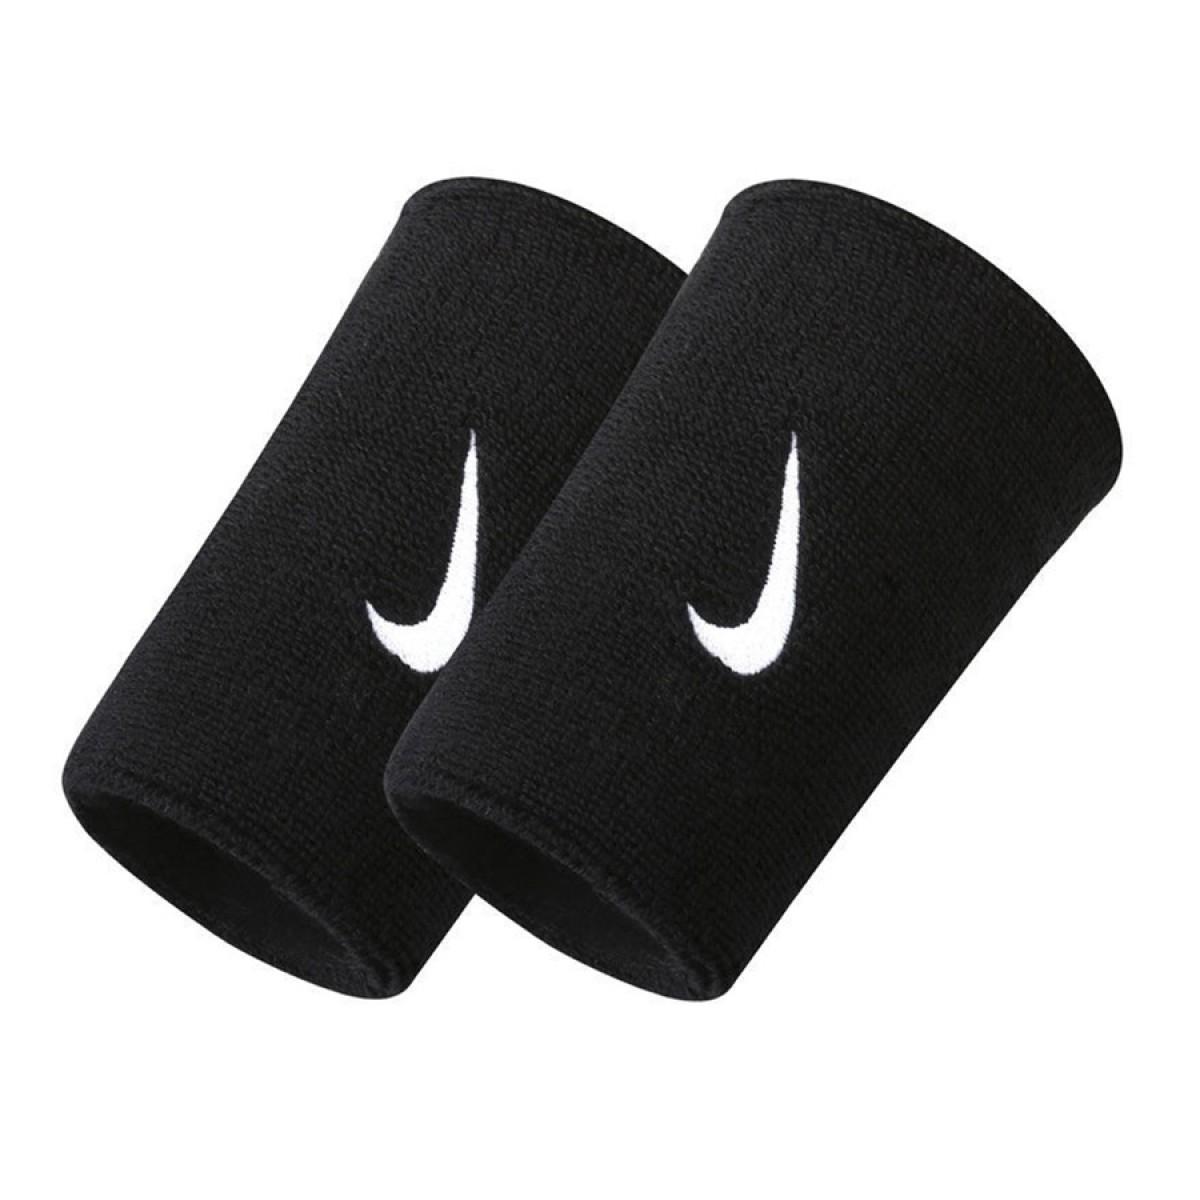 Nike Double Wristband 'Black'